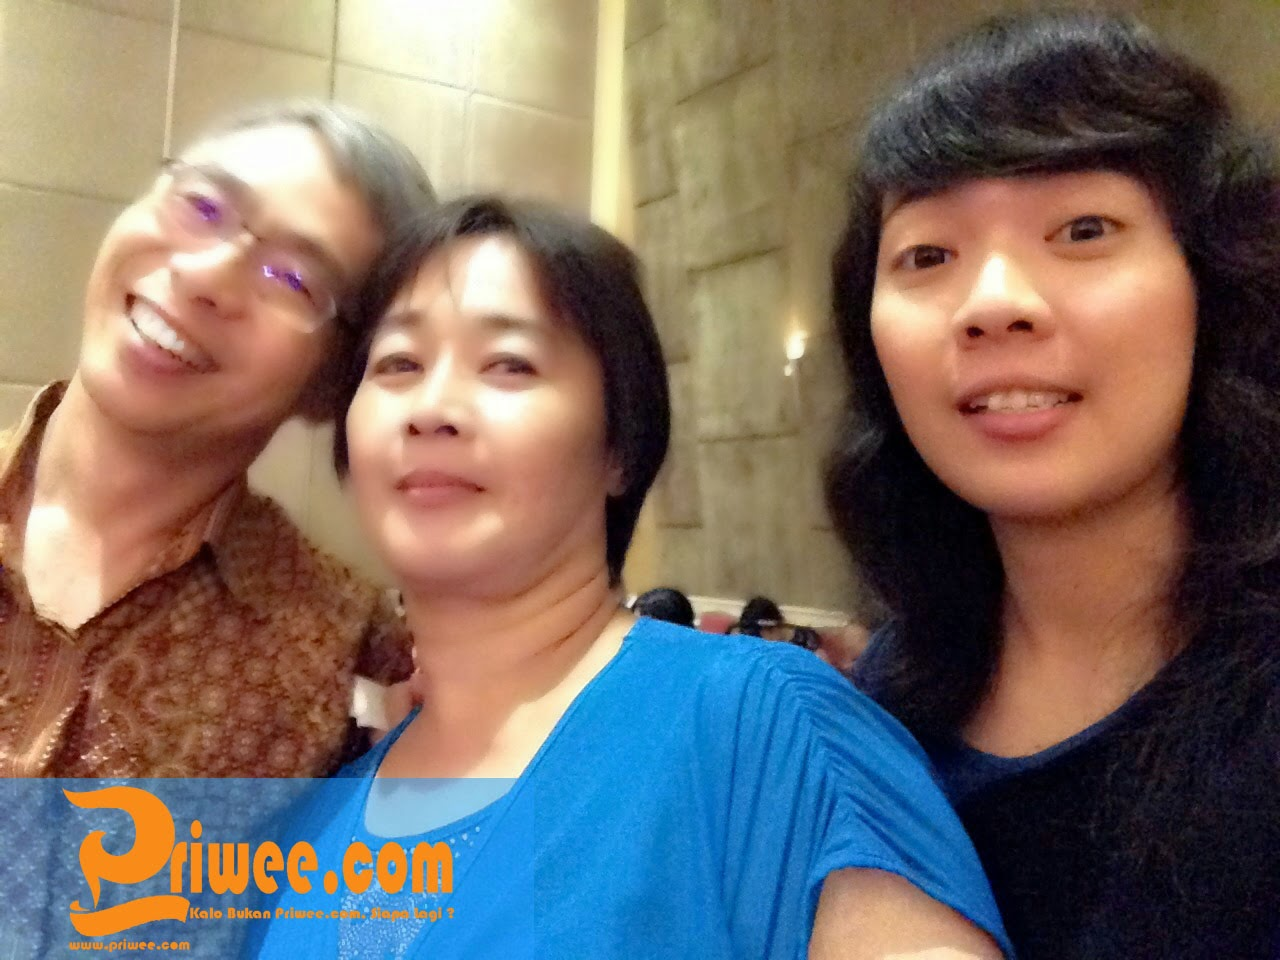 Keluarga dan Sahabat Mudah Menerima Pasanganmu dengan Baik